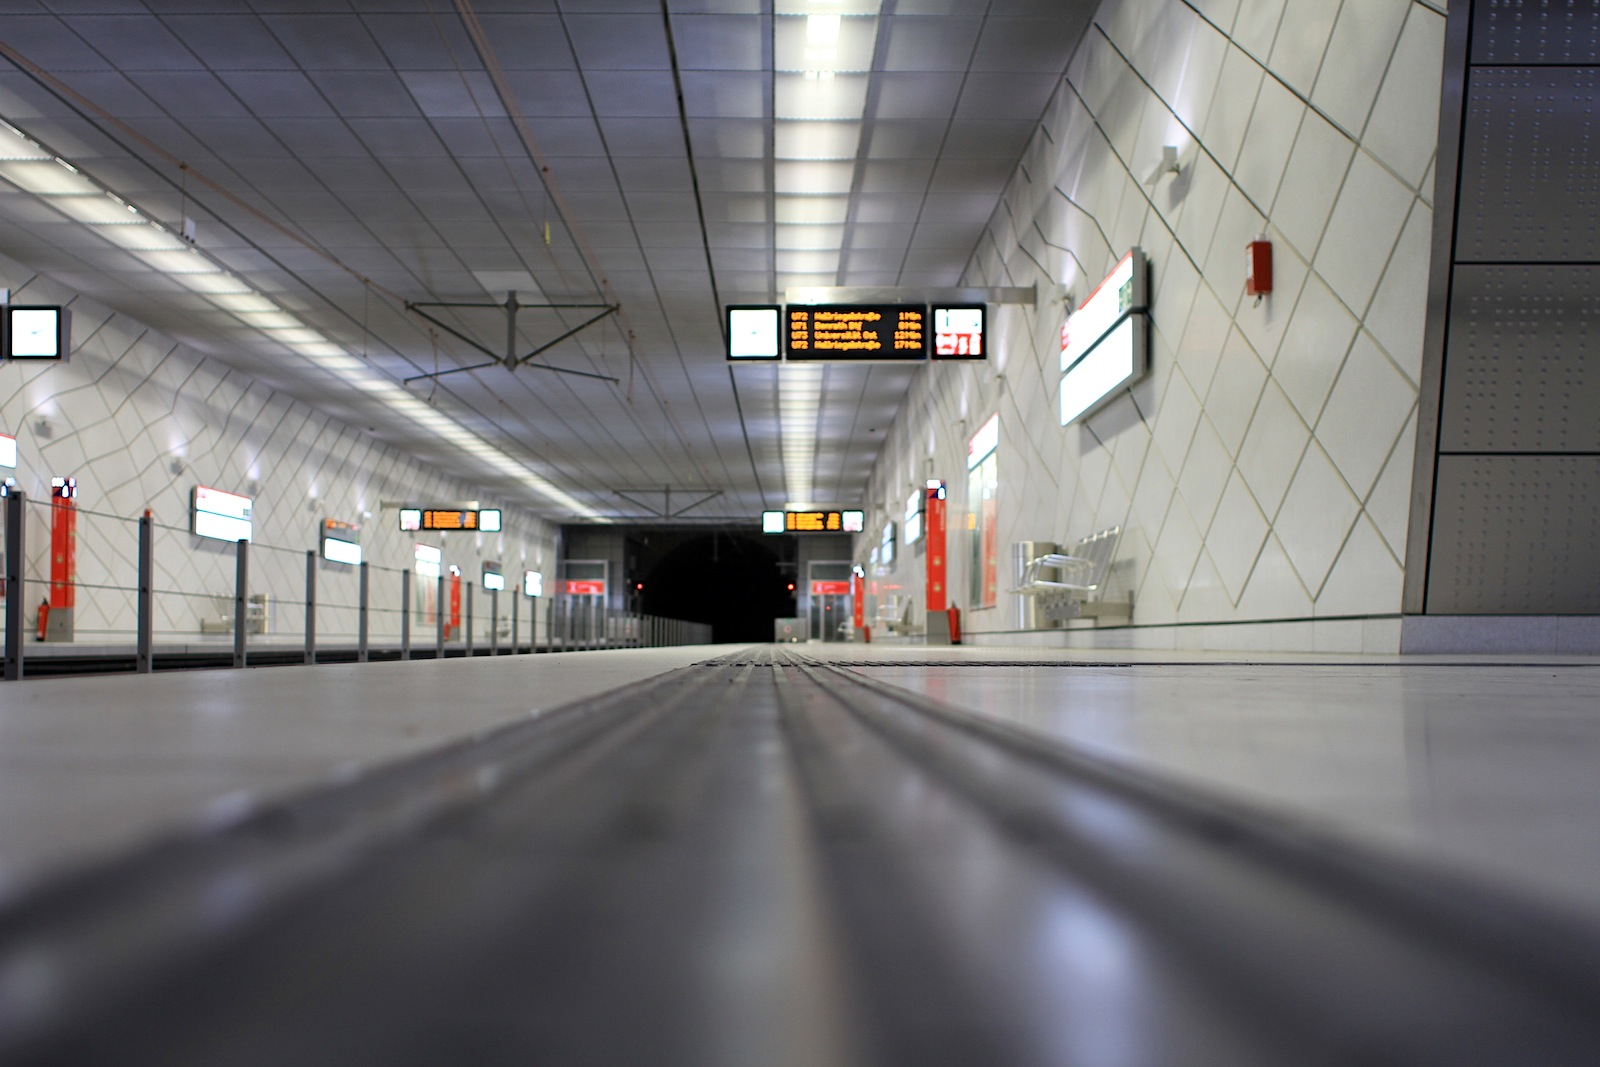 Station Benrather Straße.